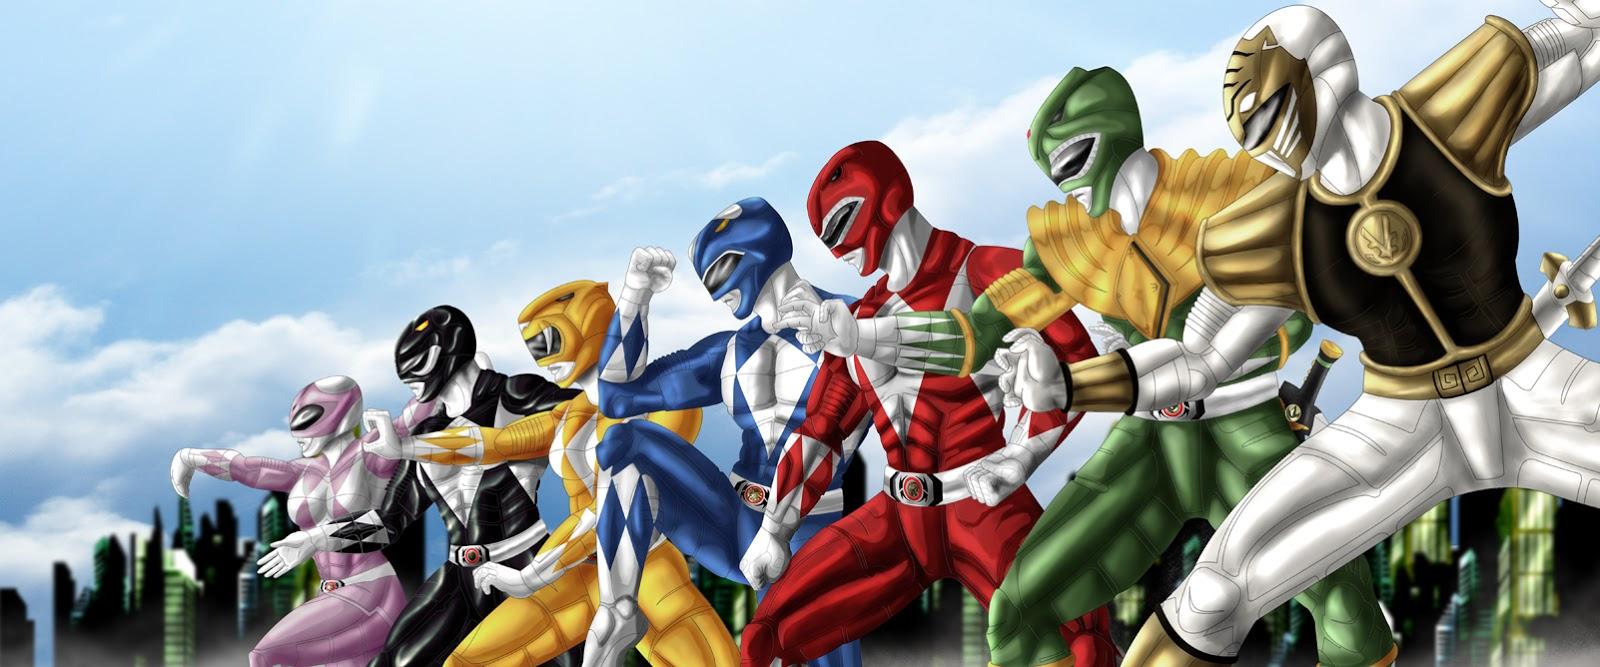 Power Rangers Go!: Mighty Morphin Powe Rangers